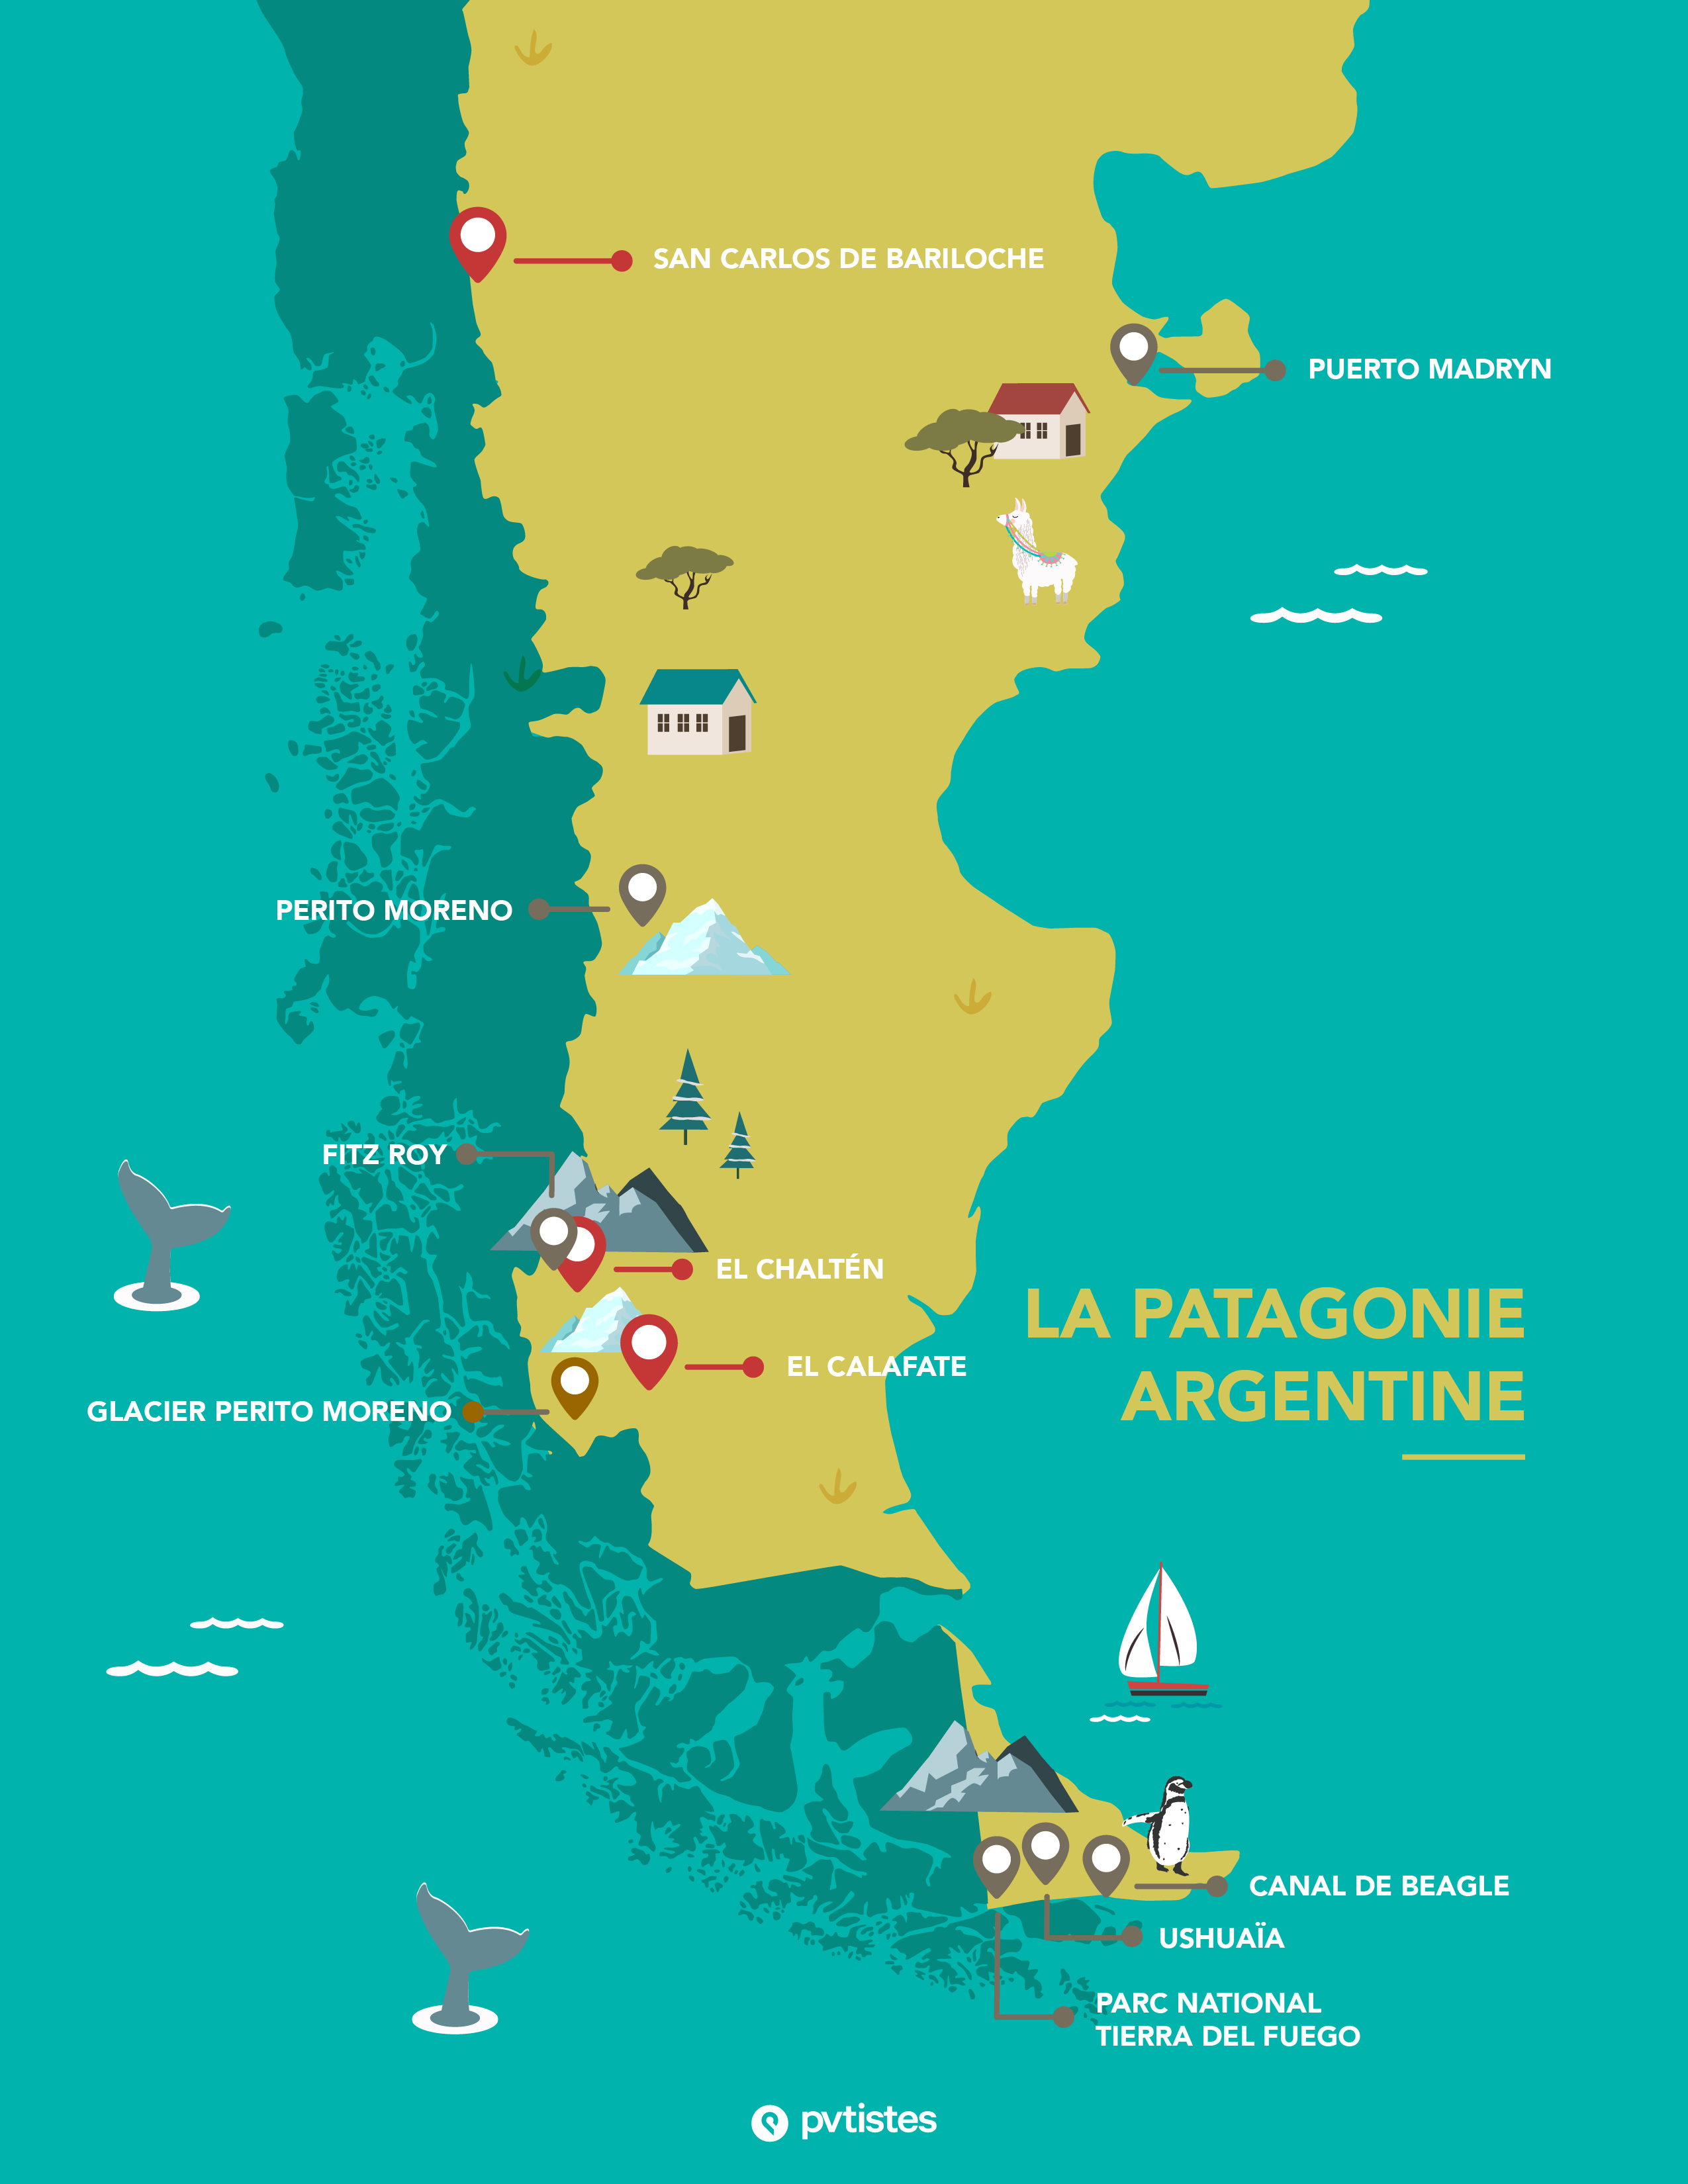 CARTE_PATAGONIE_ARGENTINE